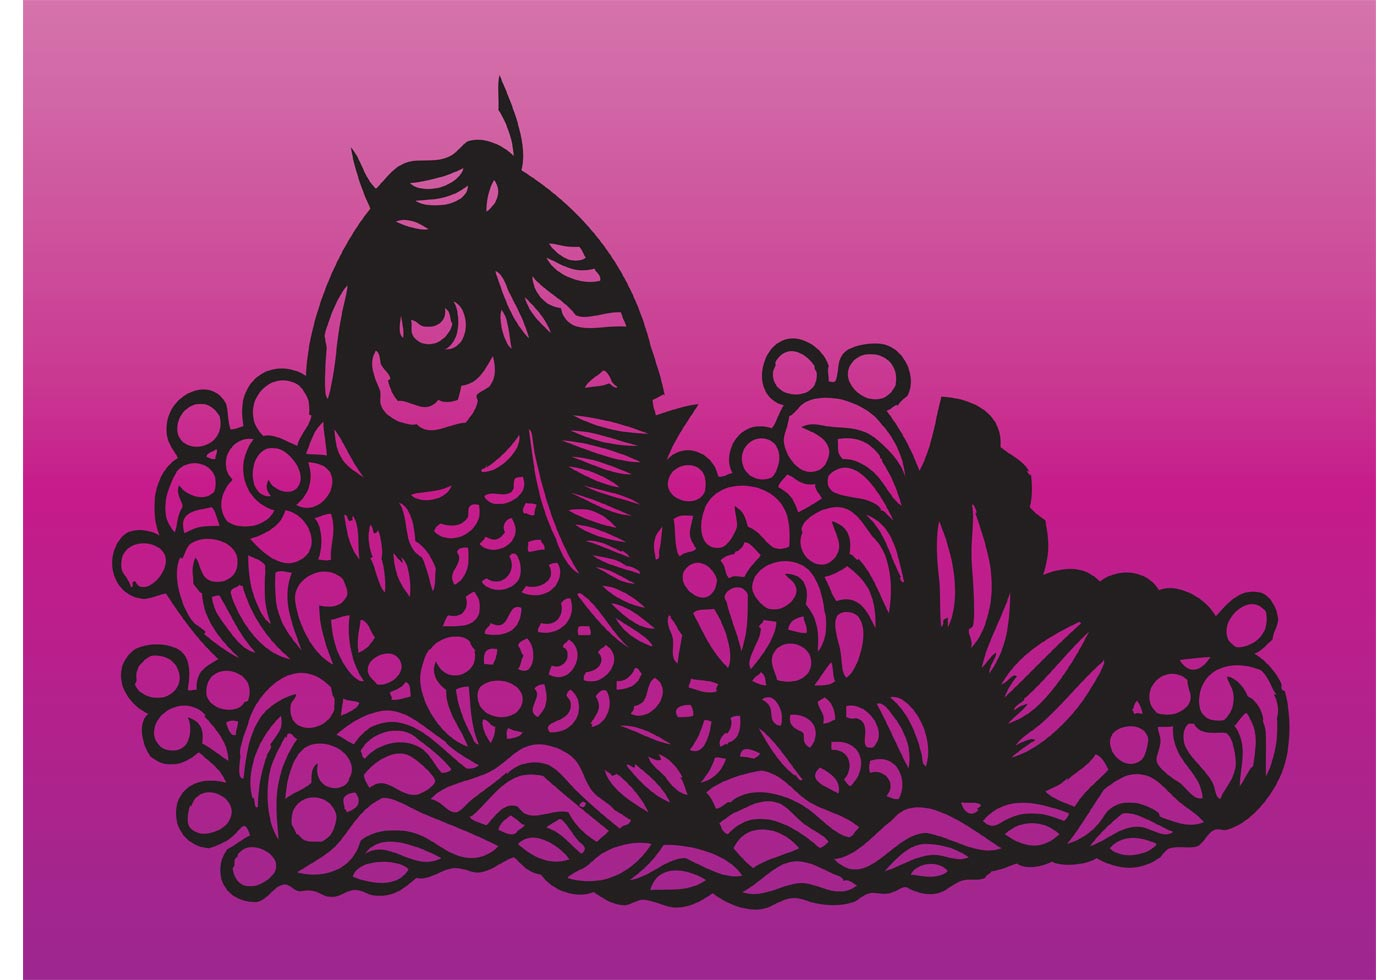 Koi fish free vector art 2186 free downloads for Koi fish vector